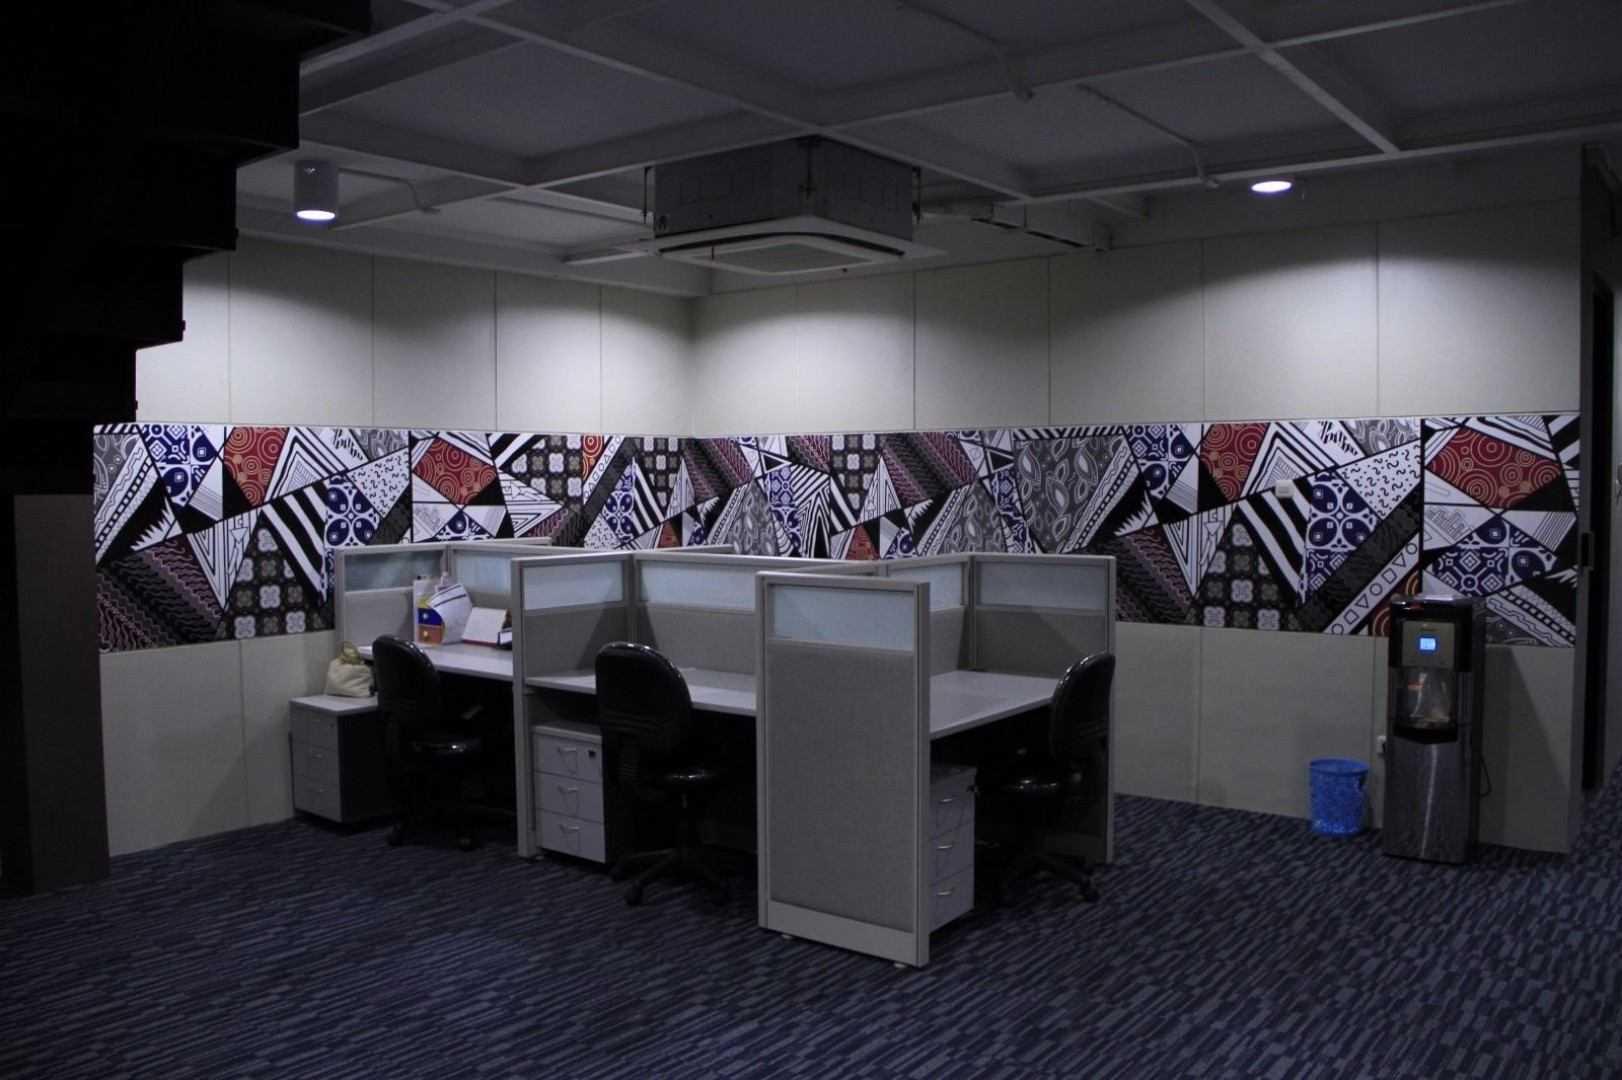 Kottagaris Interior Design Consultant Pt. Kreasi Teknologi Solusindo Surabaya, Kota Sby, Jawa Timur, Indonesia Surabaya, Kota Sby, Jawa Timur, Indonesia Working Area   54622